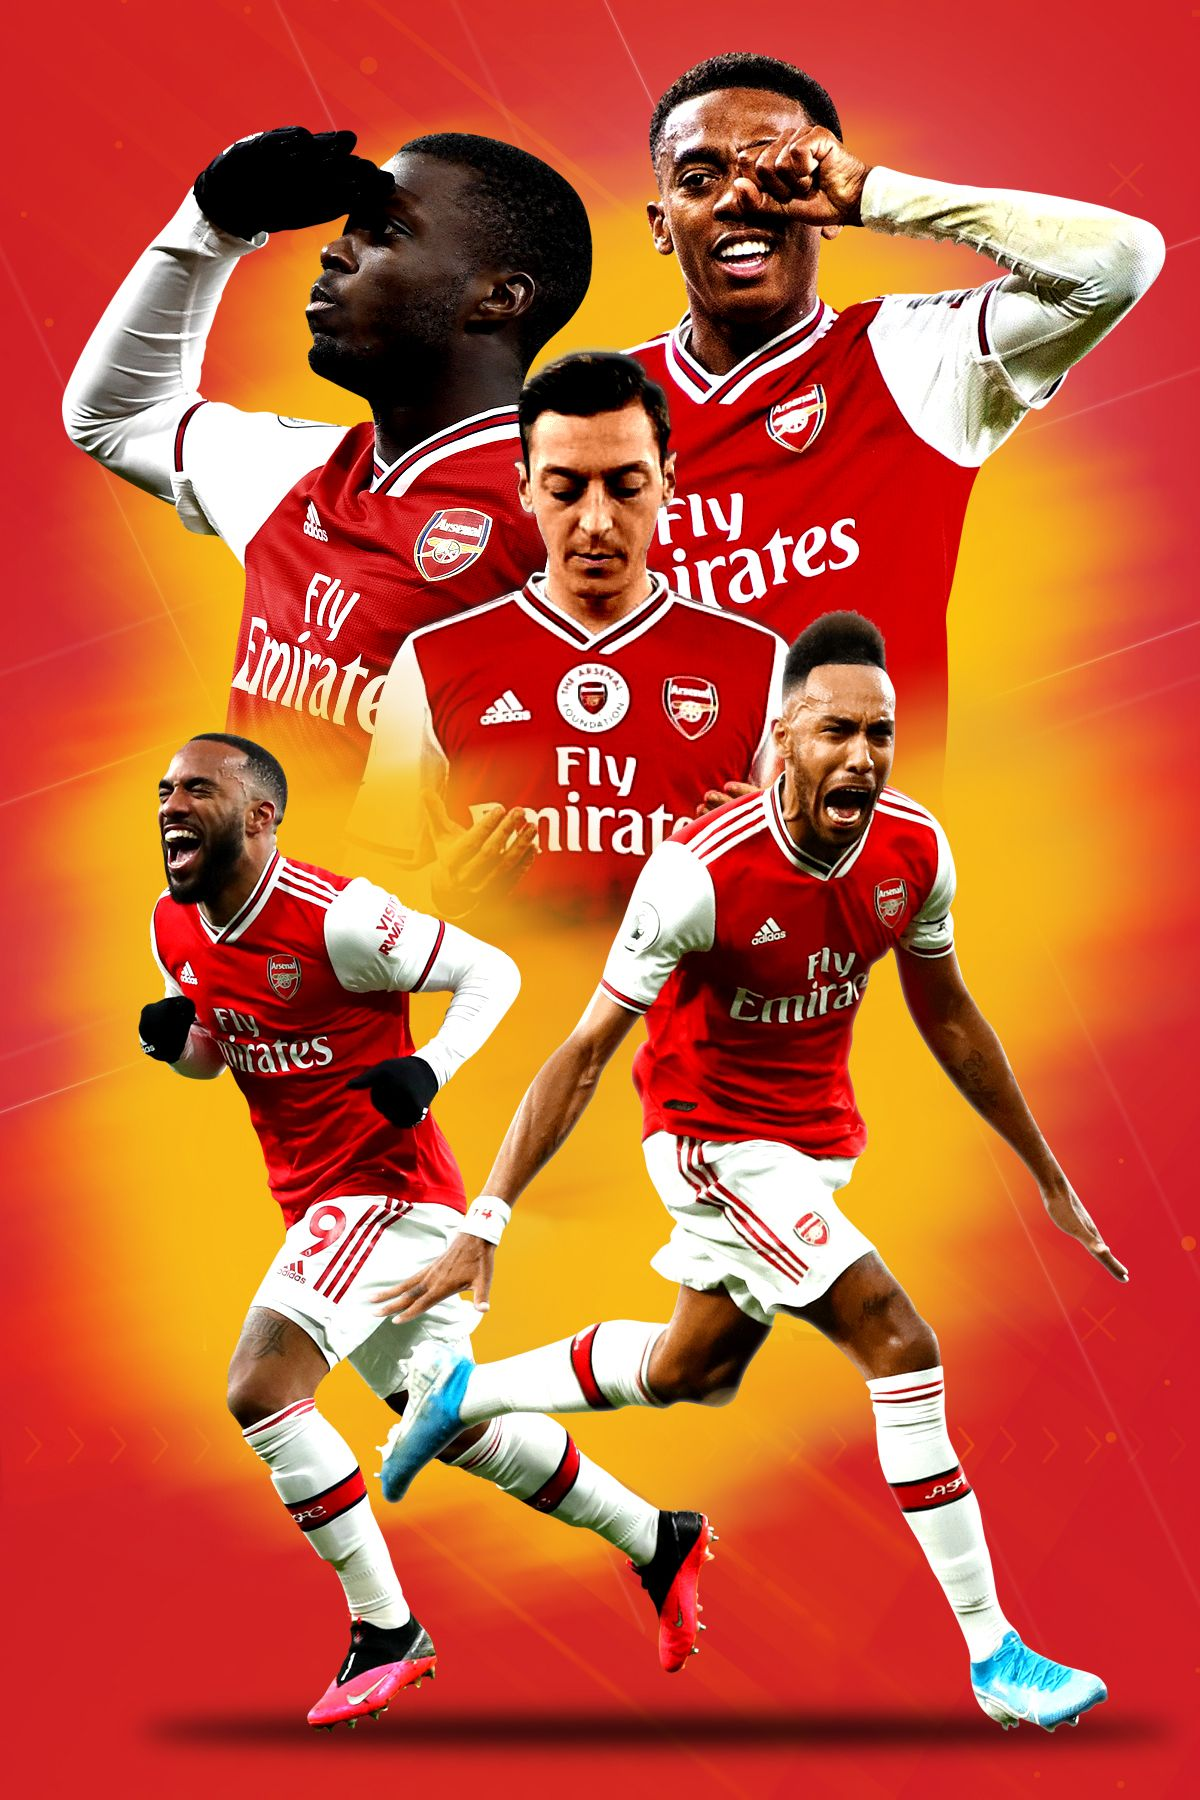 Wallpaper Arsenal Team 2020 - Hd Football